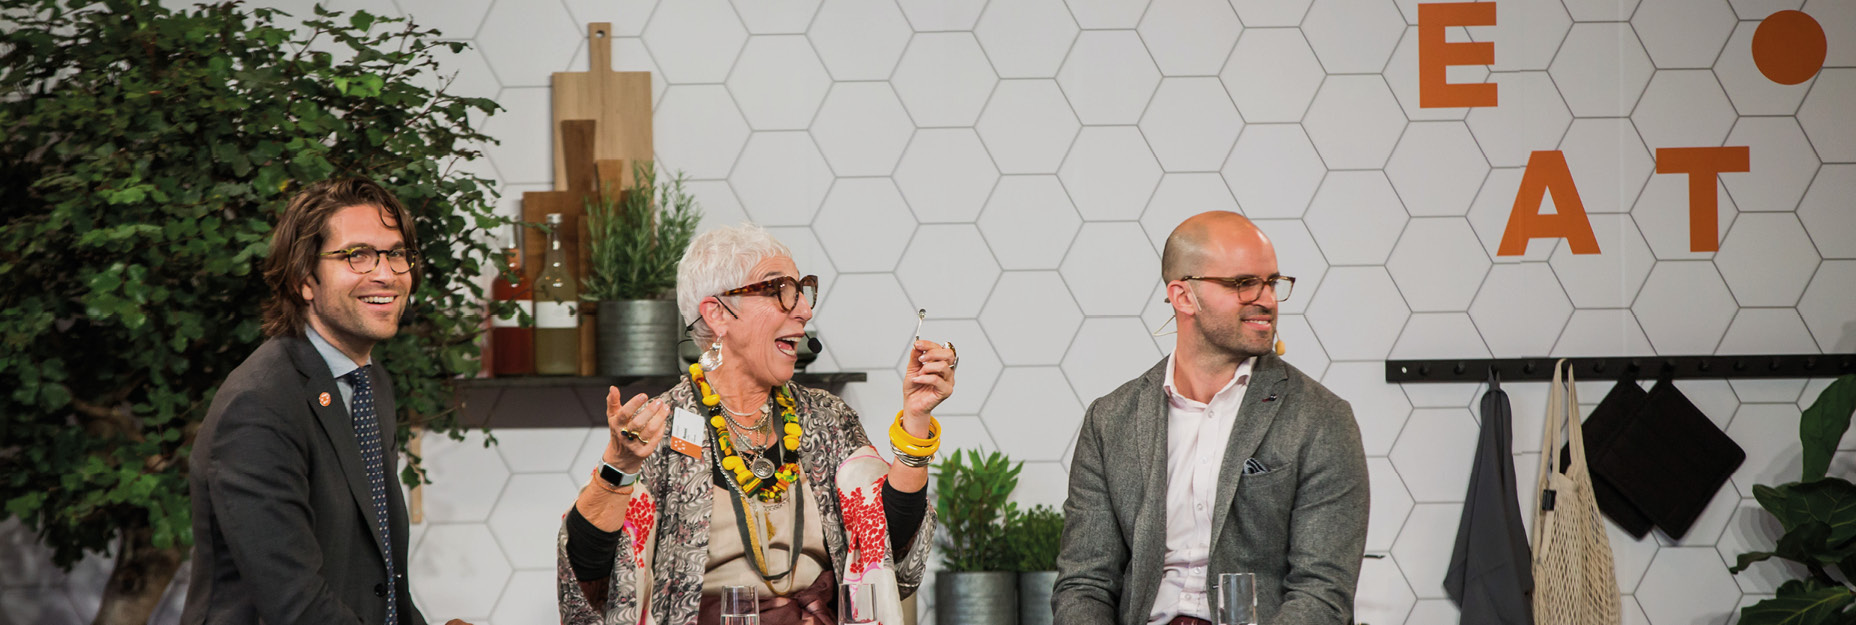 Ronni Kahn (center) speaking during EAT Forum 2019